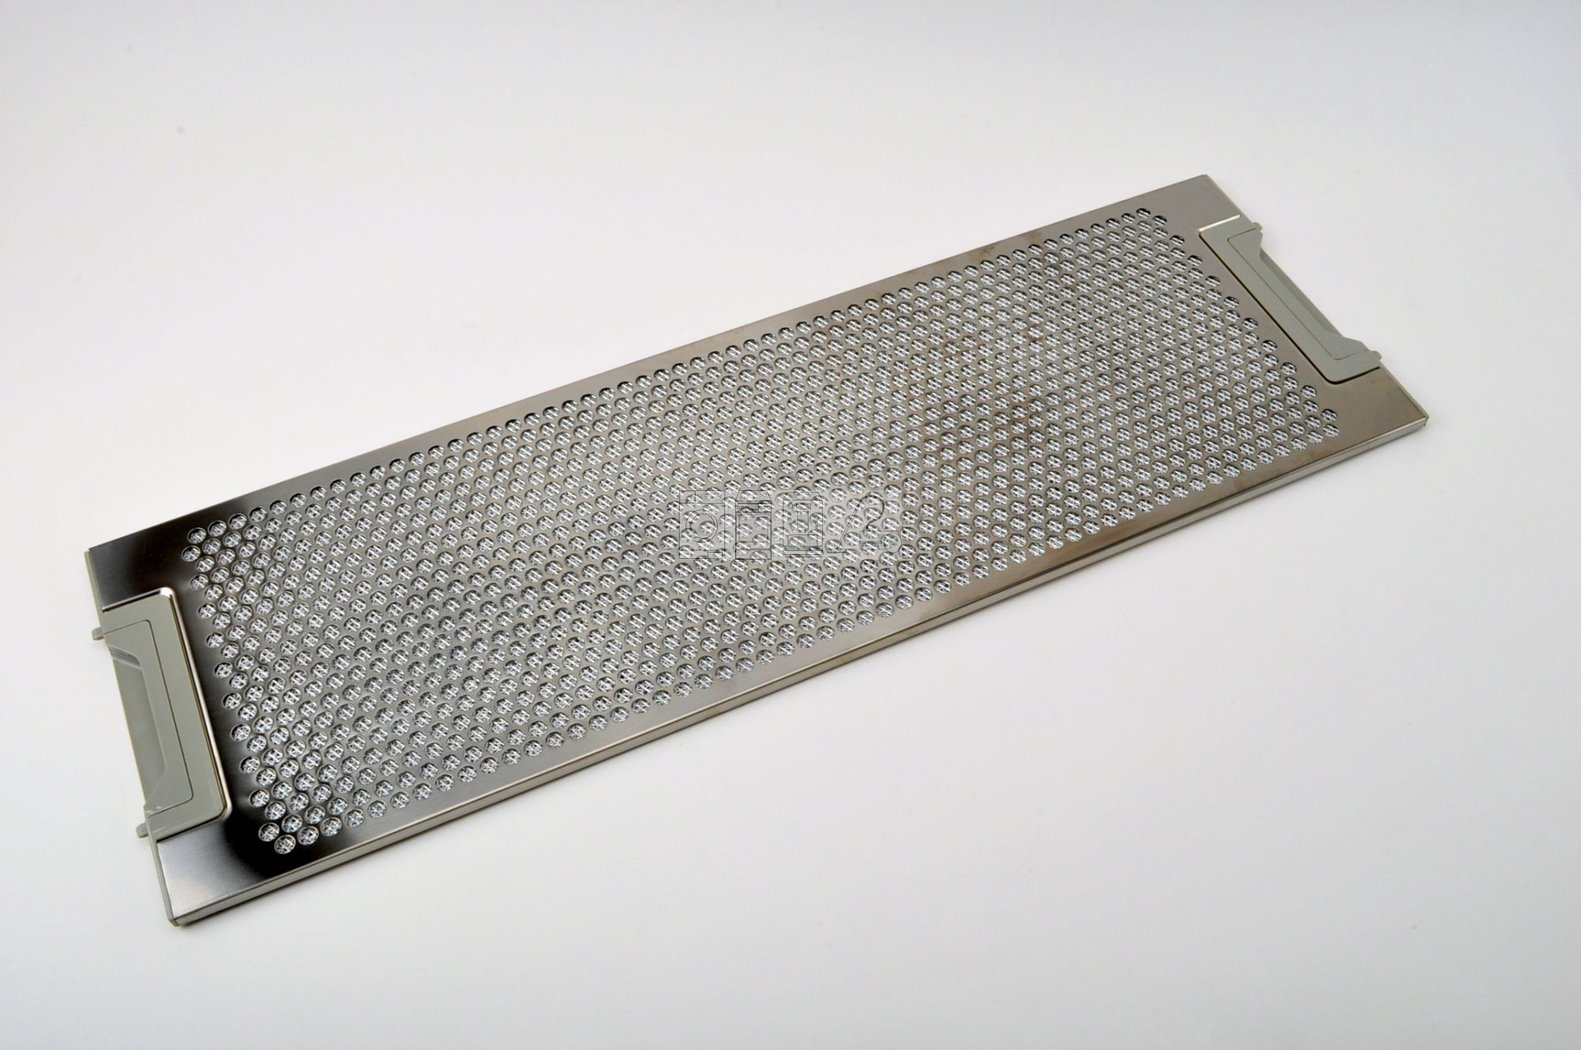 progress dunstabzugshaube filter metall fettfilter dunstabzugshaube mm elektrolux alno aeg aeg. Black Bedroom Furniture Sets. Home Design Ideas